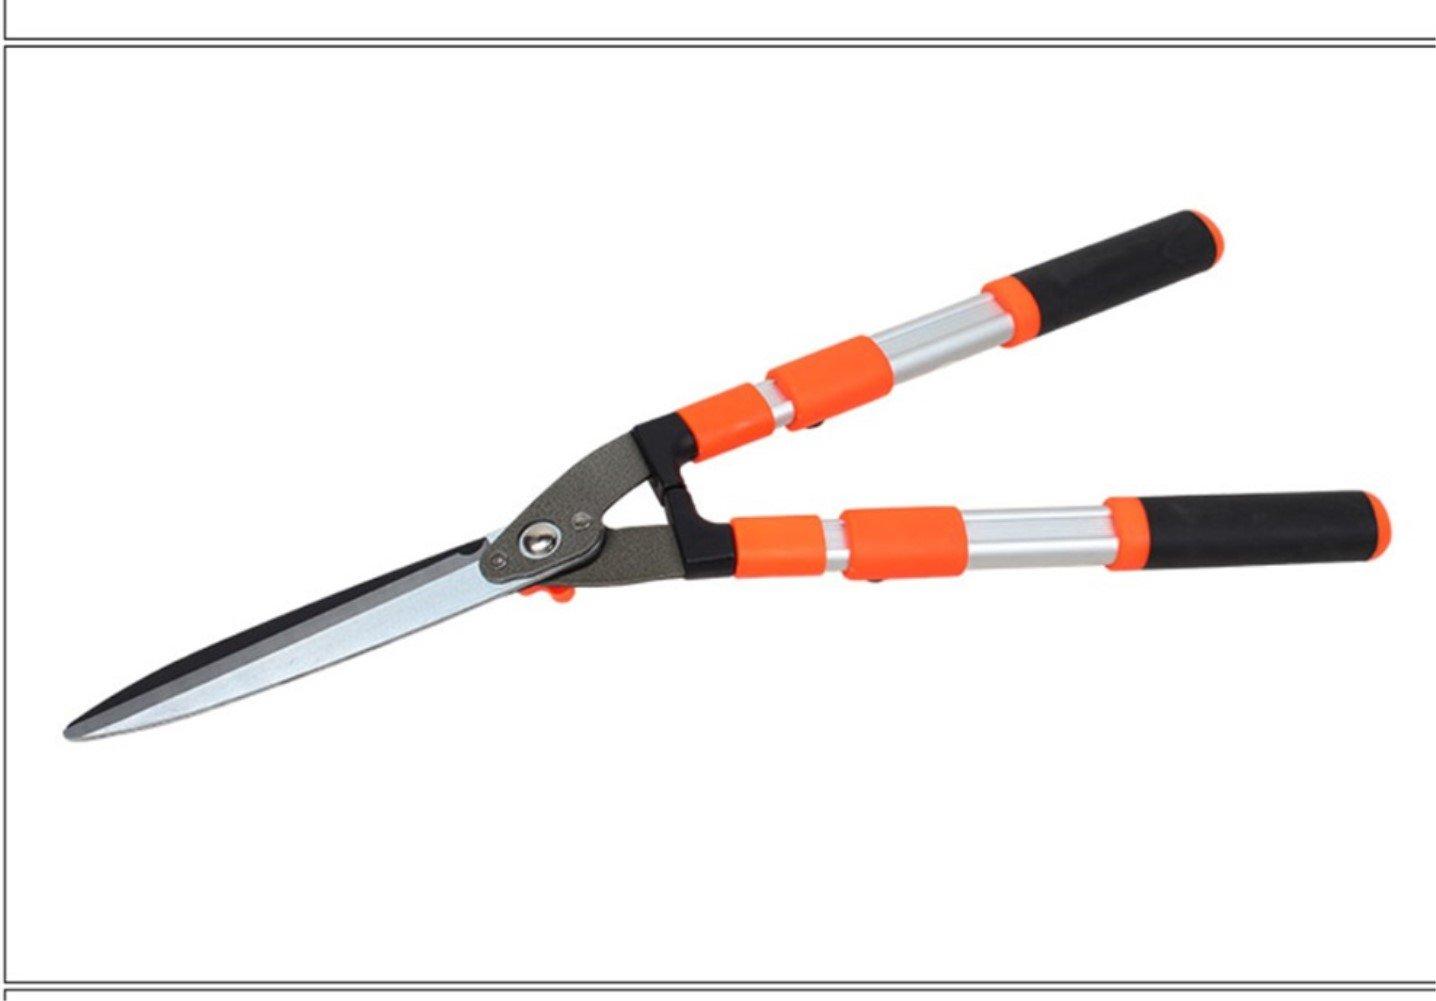 KJYTOOLS Gardening Scissors Hedgerow Trimming Greening Garden Tools Large Scissors 1.31KG Telescopic High Strength Handle